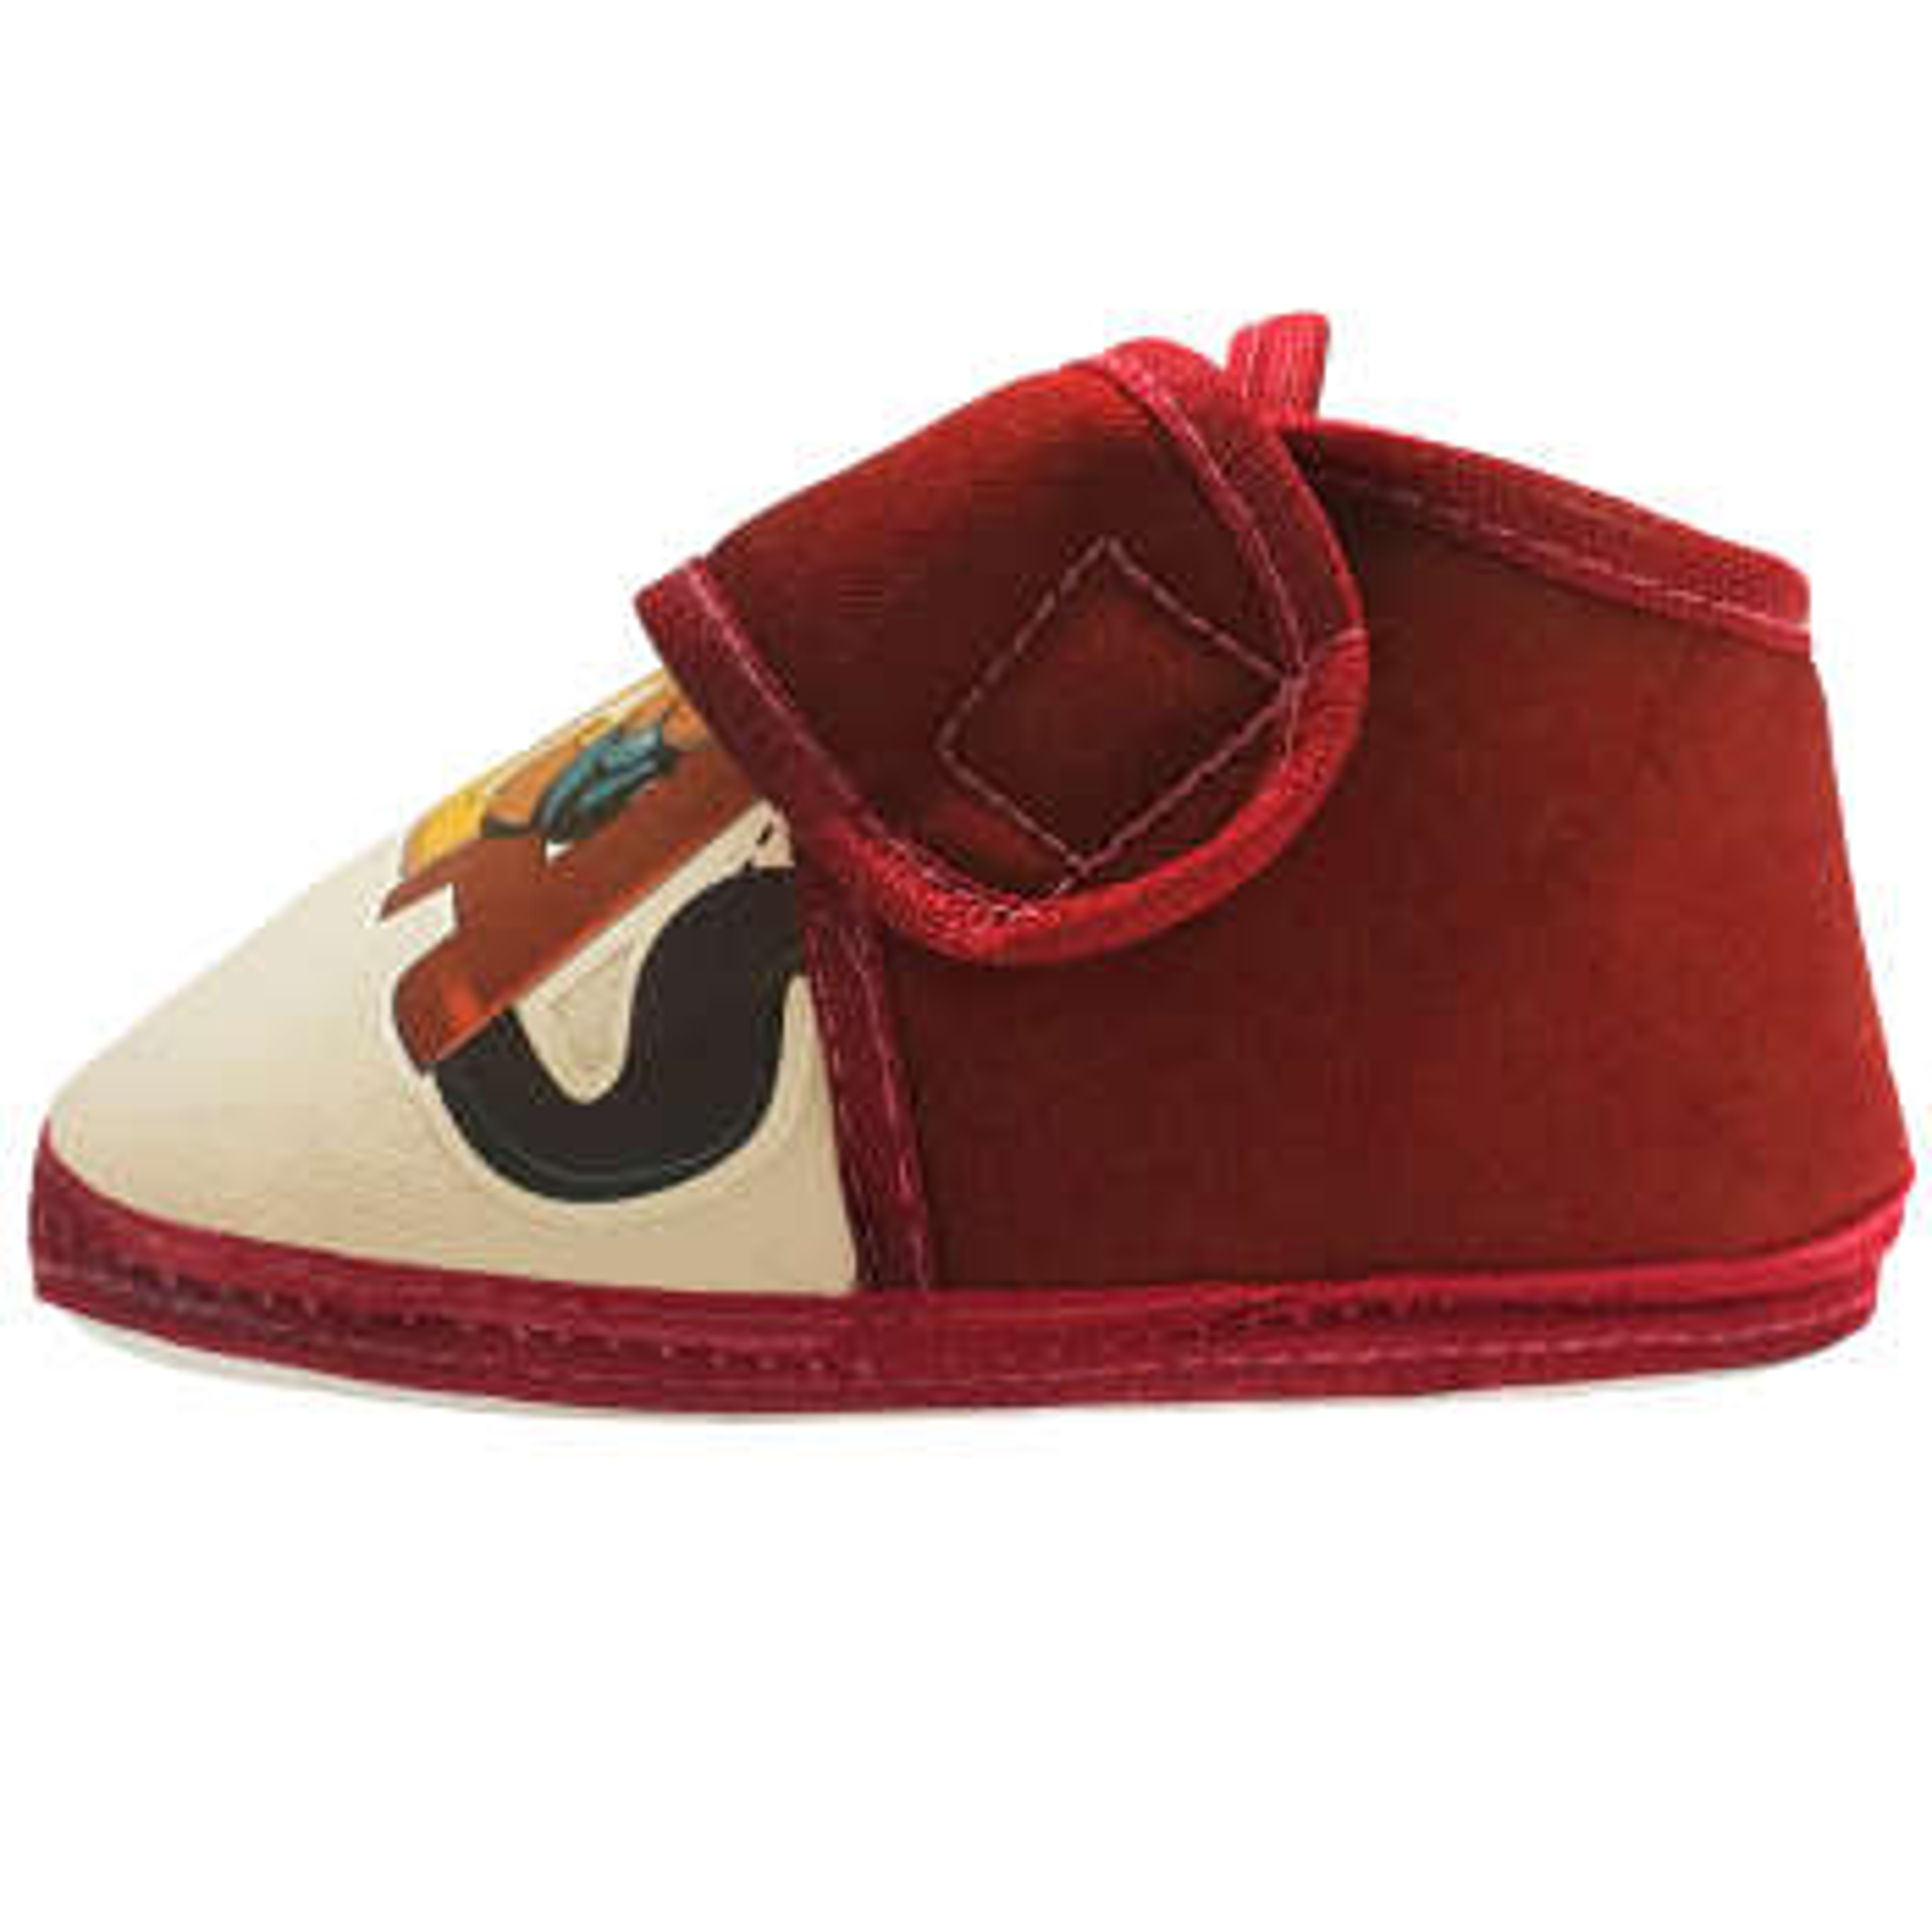 کفش نوزادی مدل آدی خرسه - 03